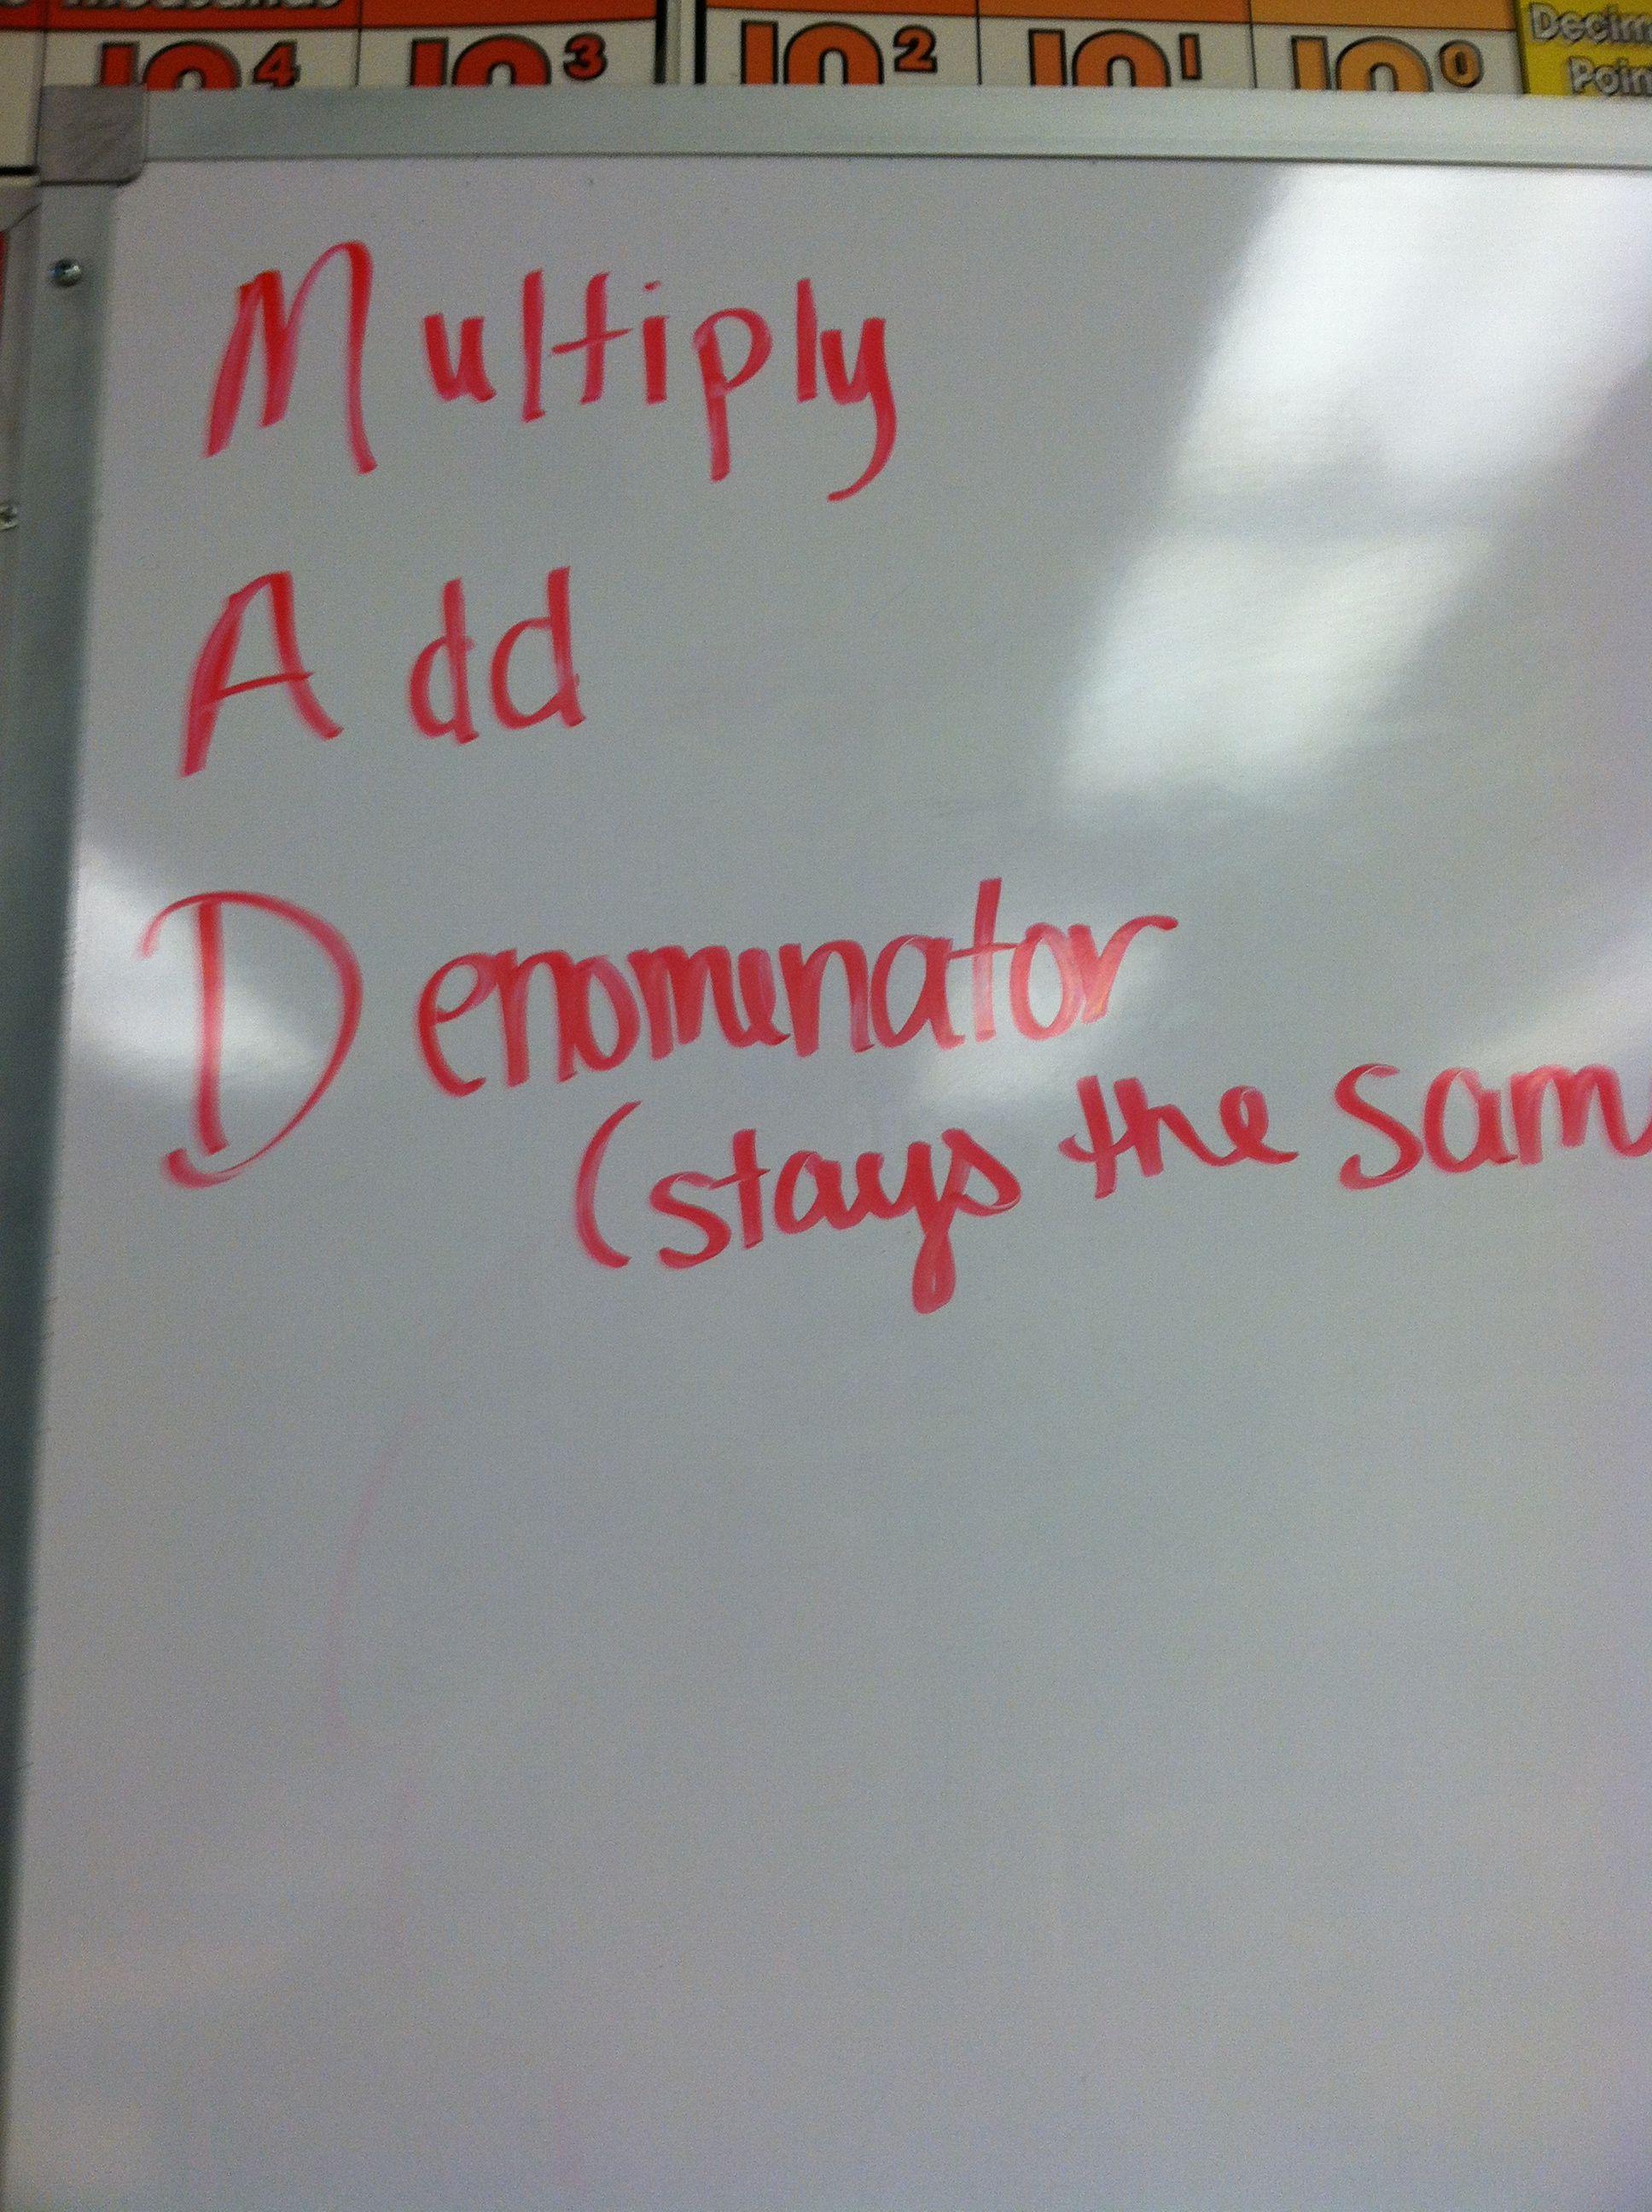 Improper fractions acronym